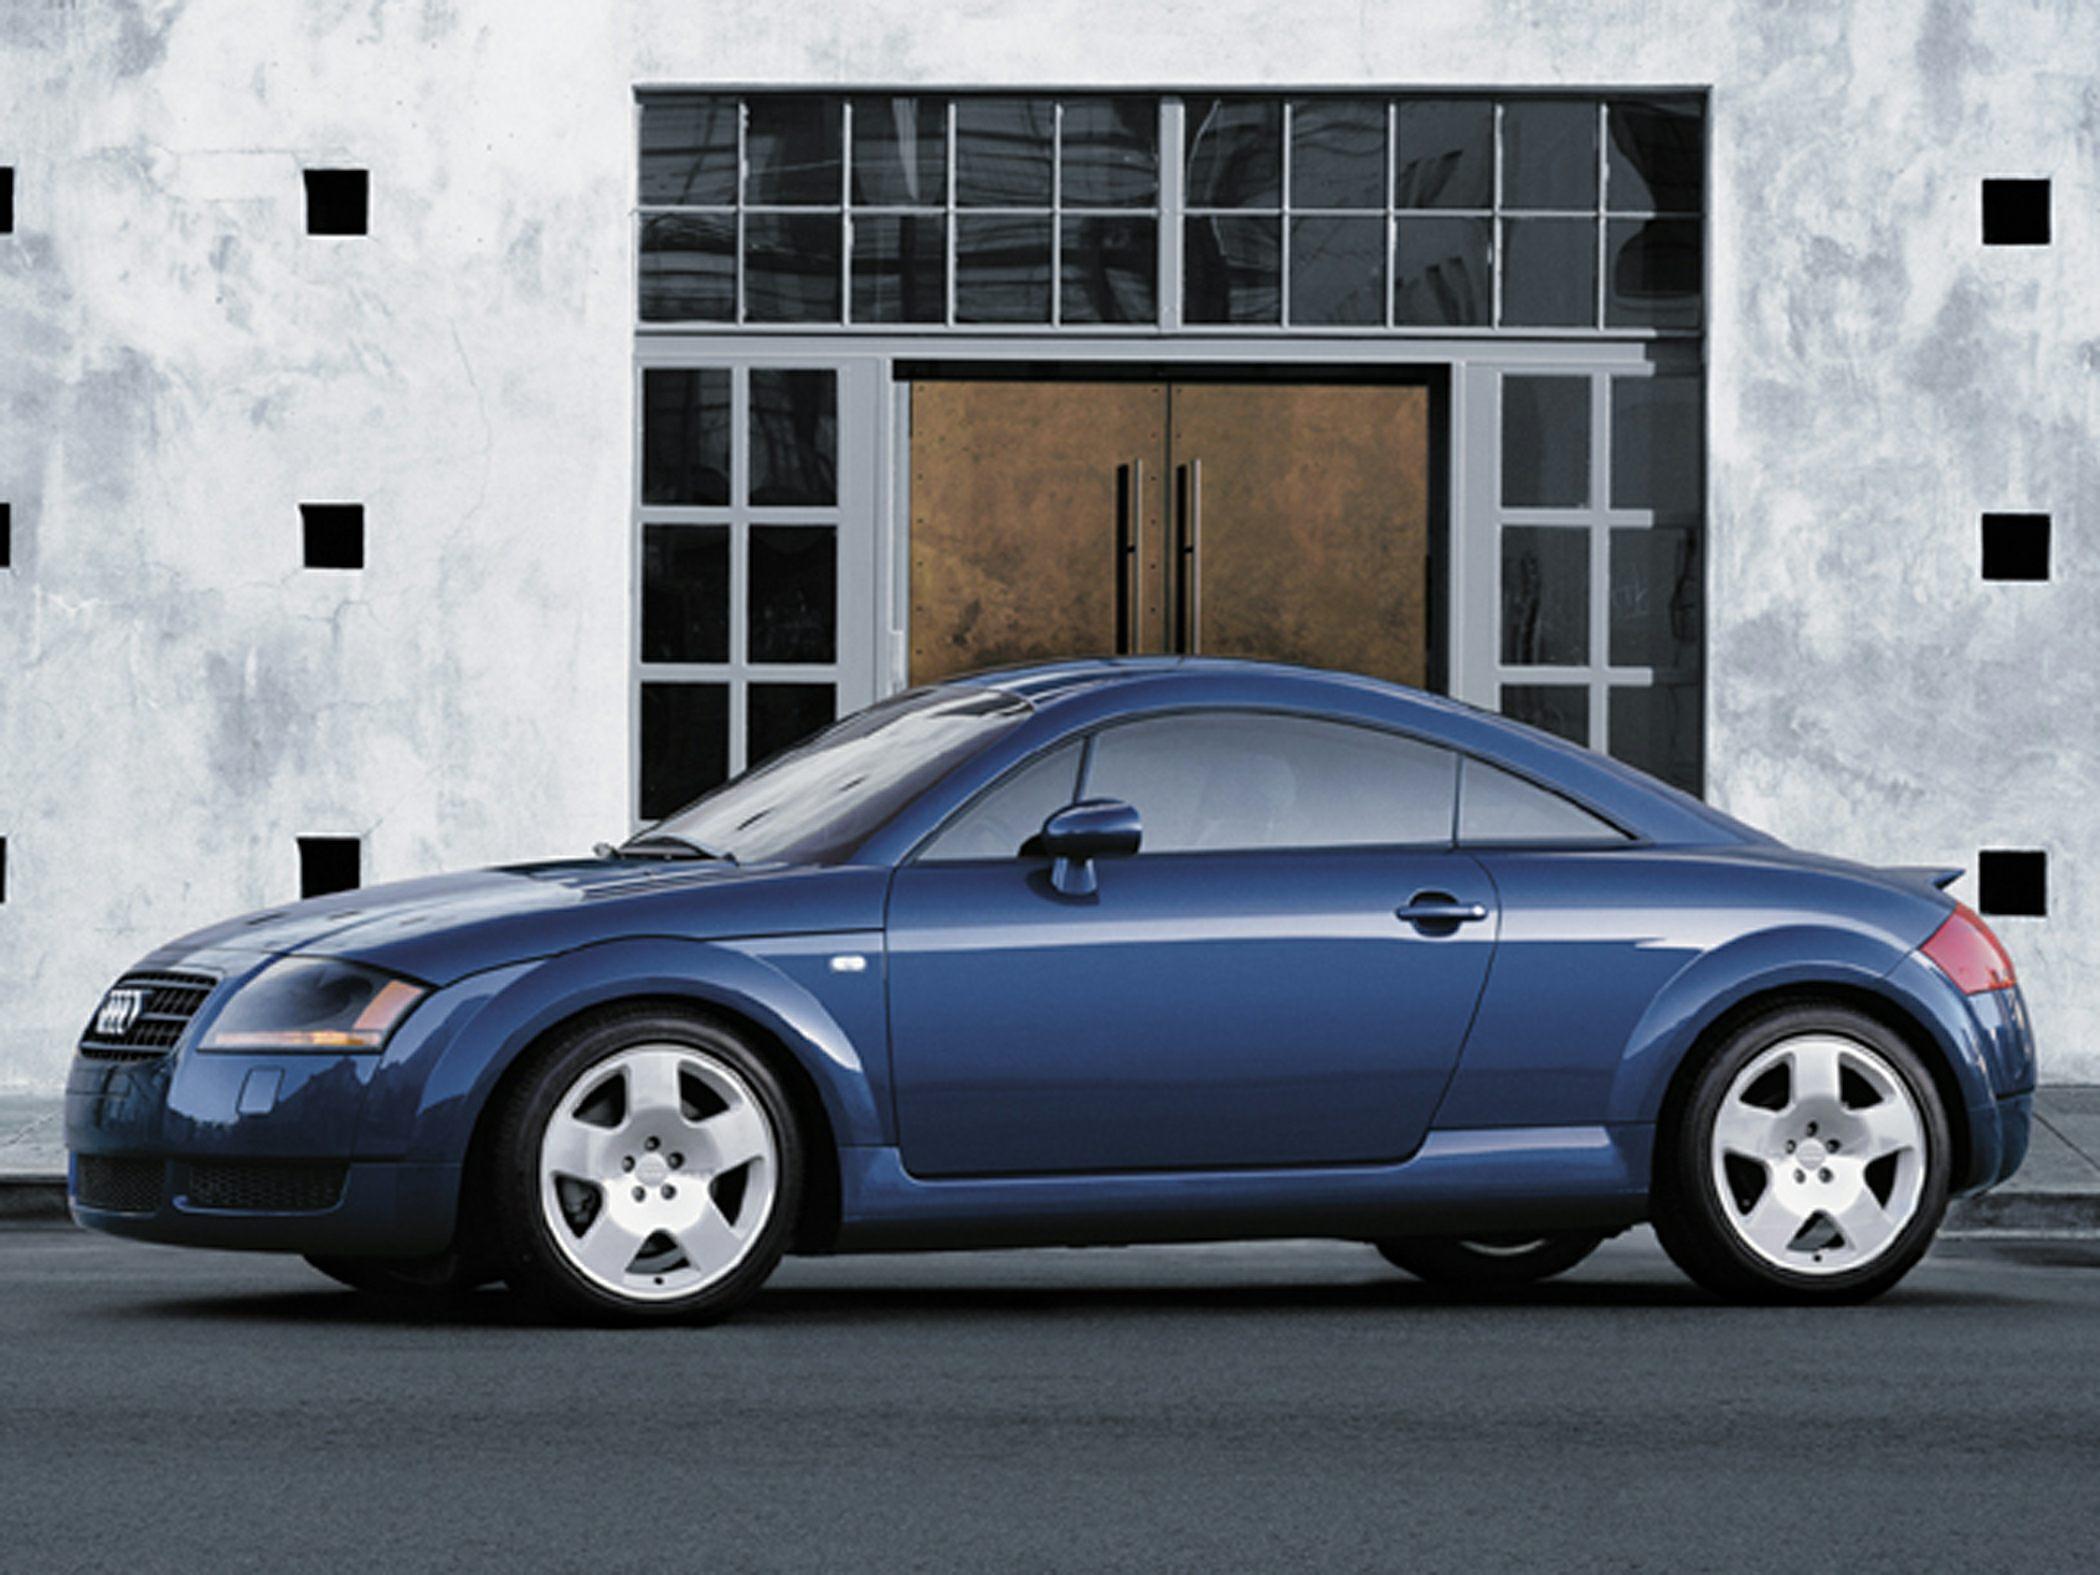 2003 Audi TT 1 8L 2dr All-wheel Drive Quattro Coupe Pictures